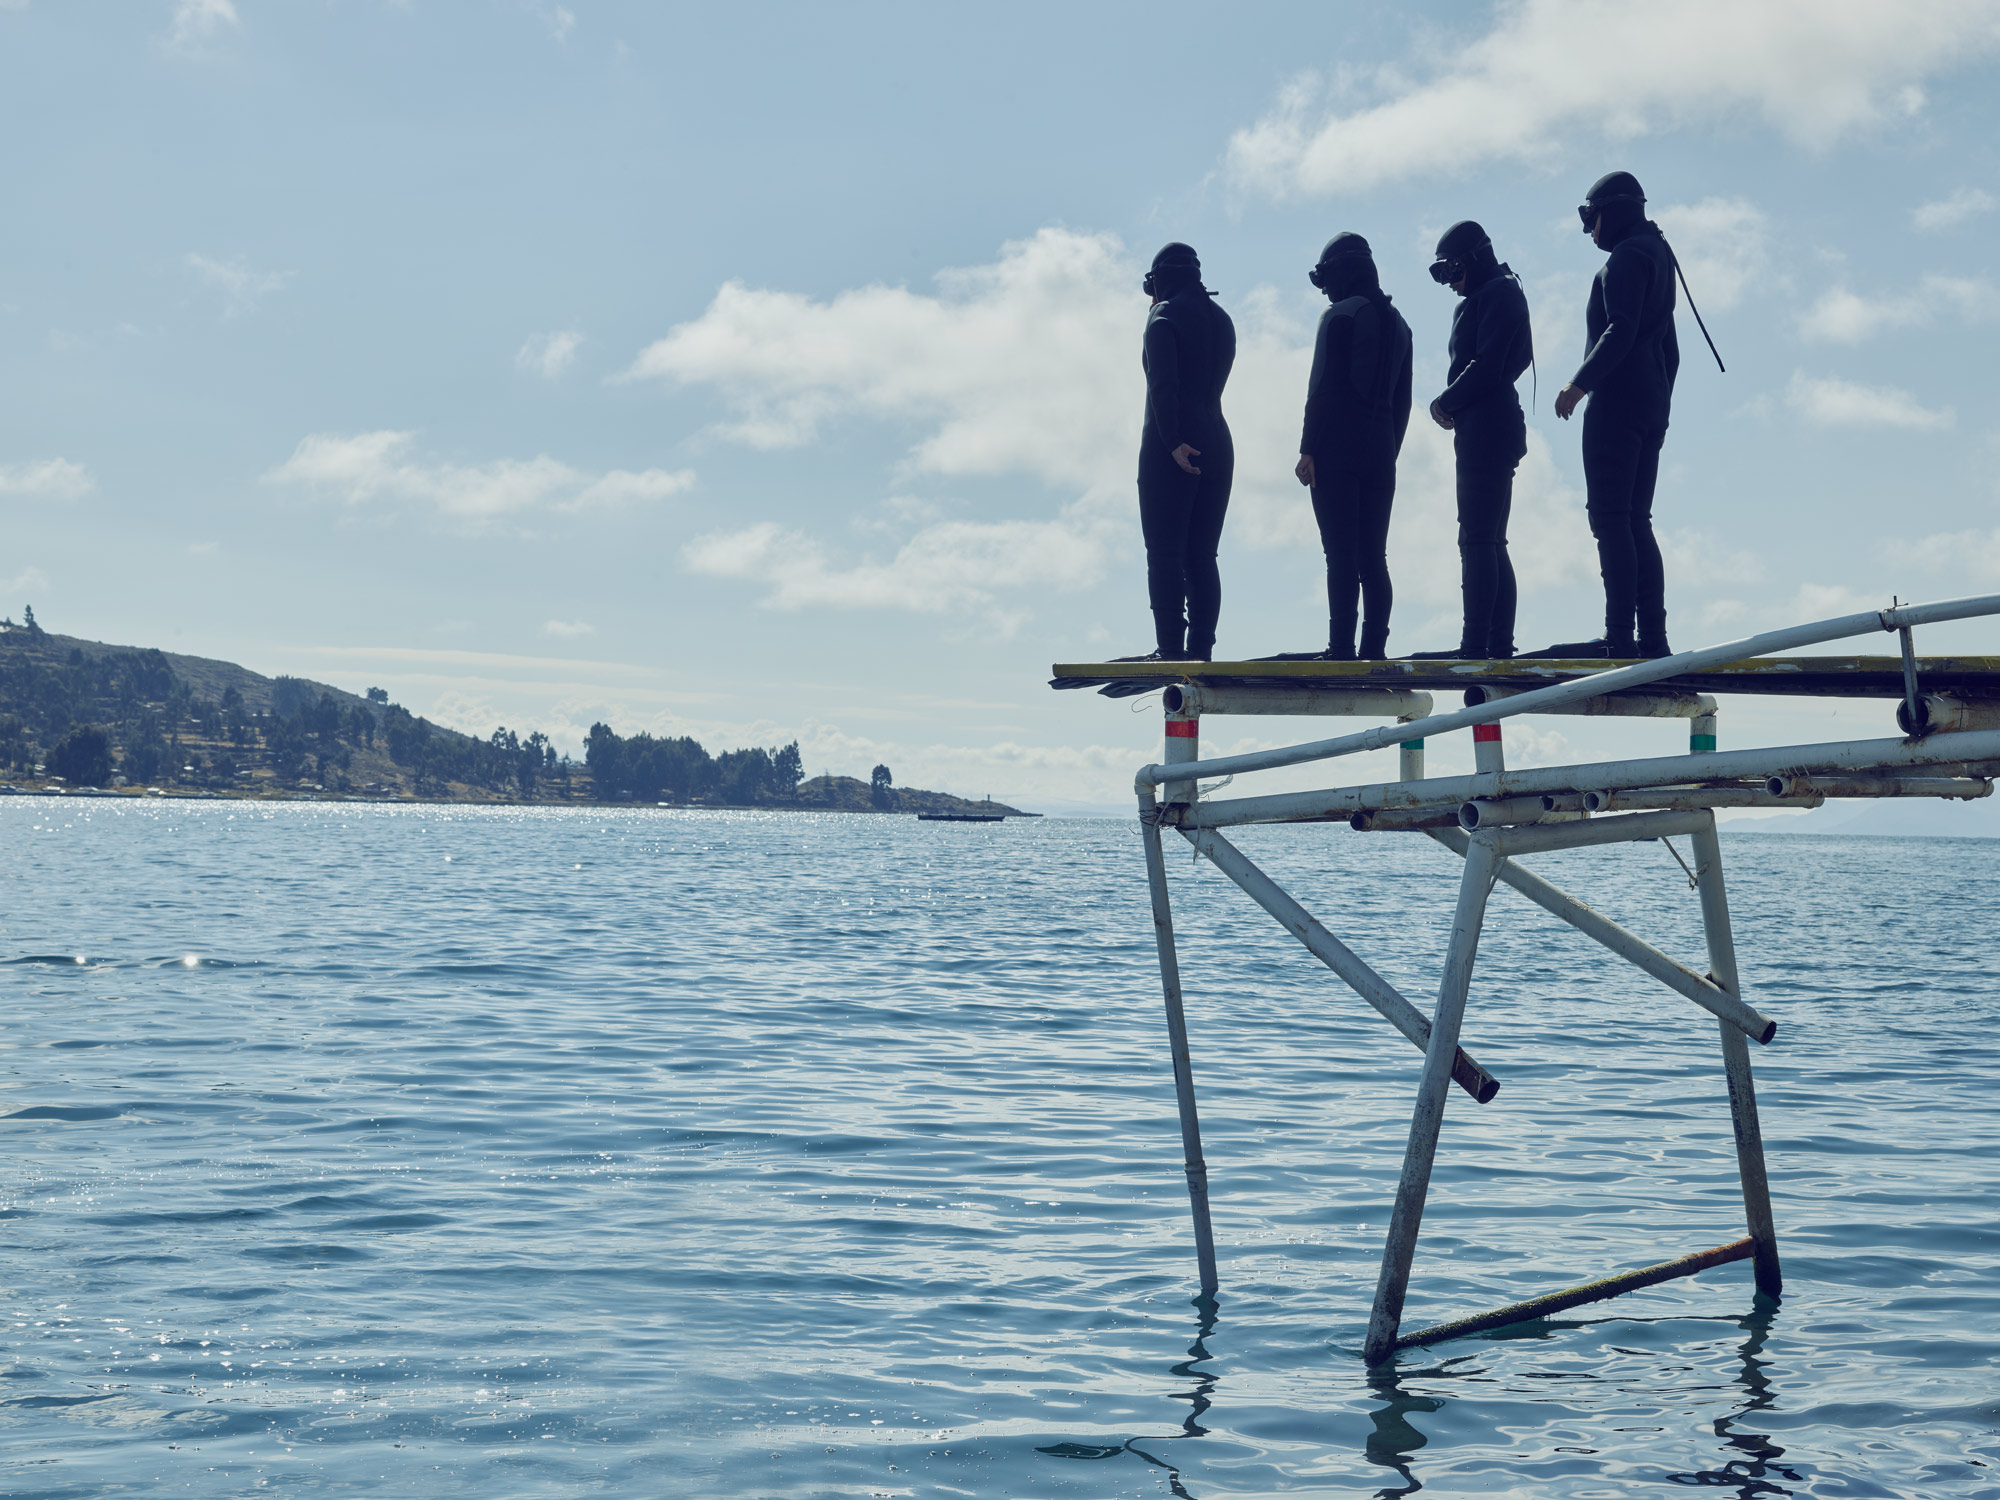 Bolivian Navy swimmers scuba